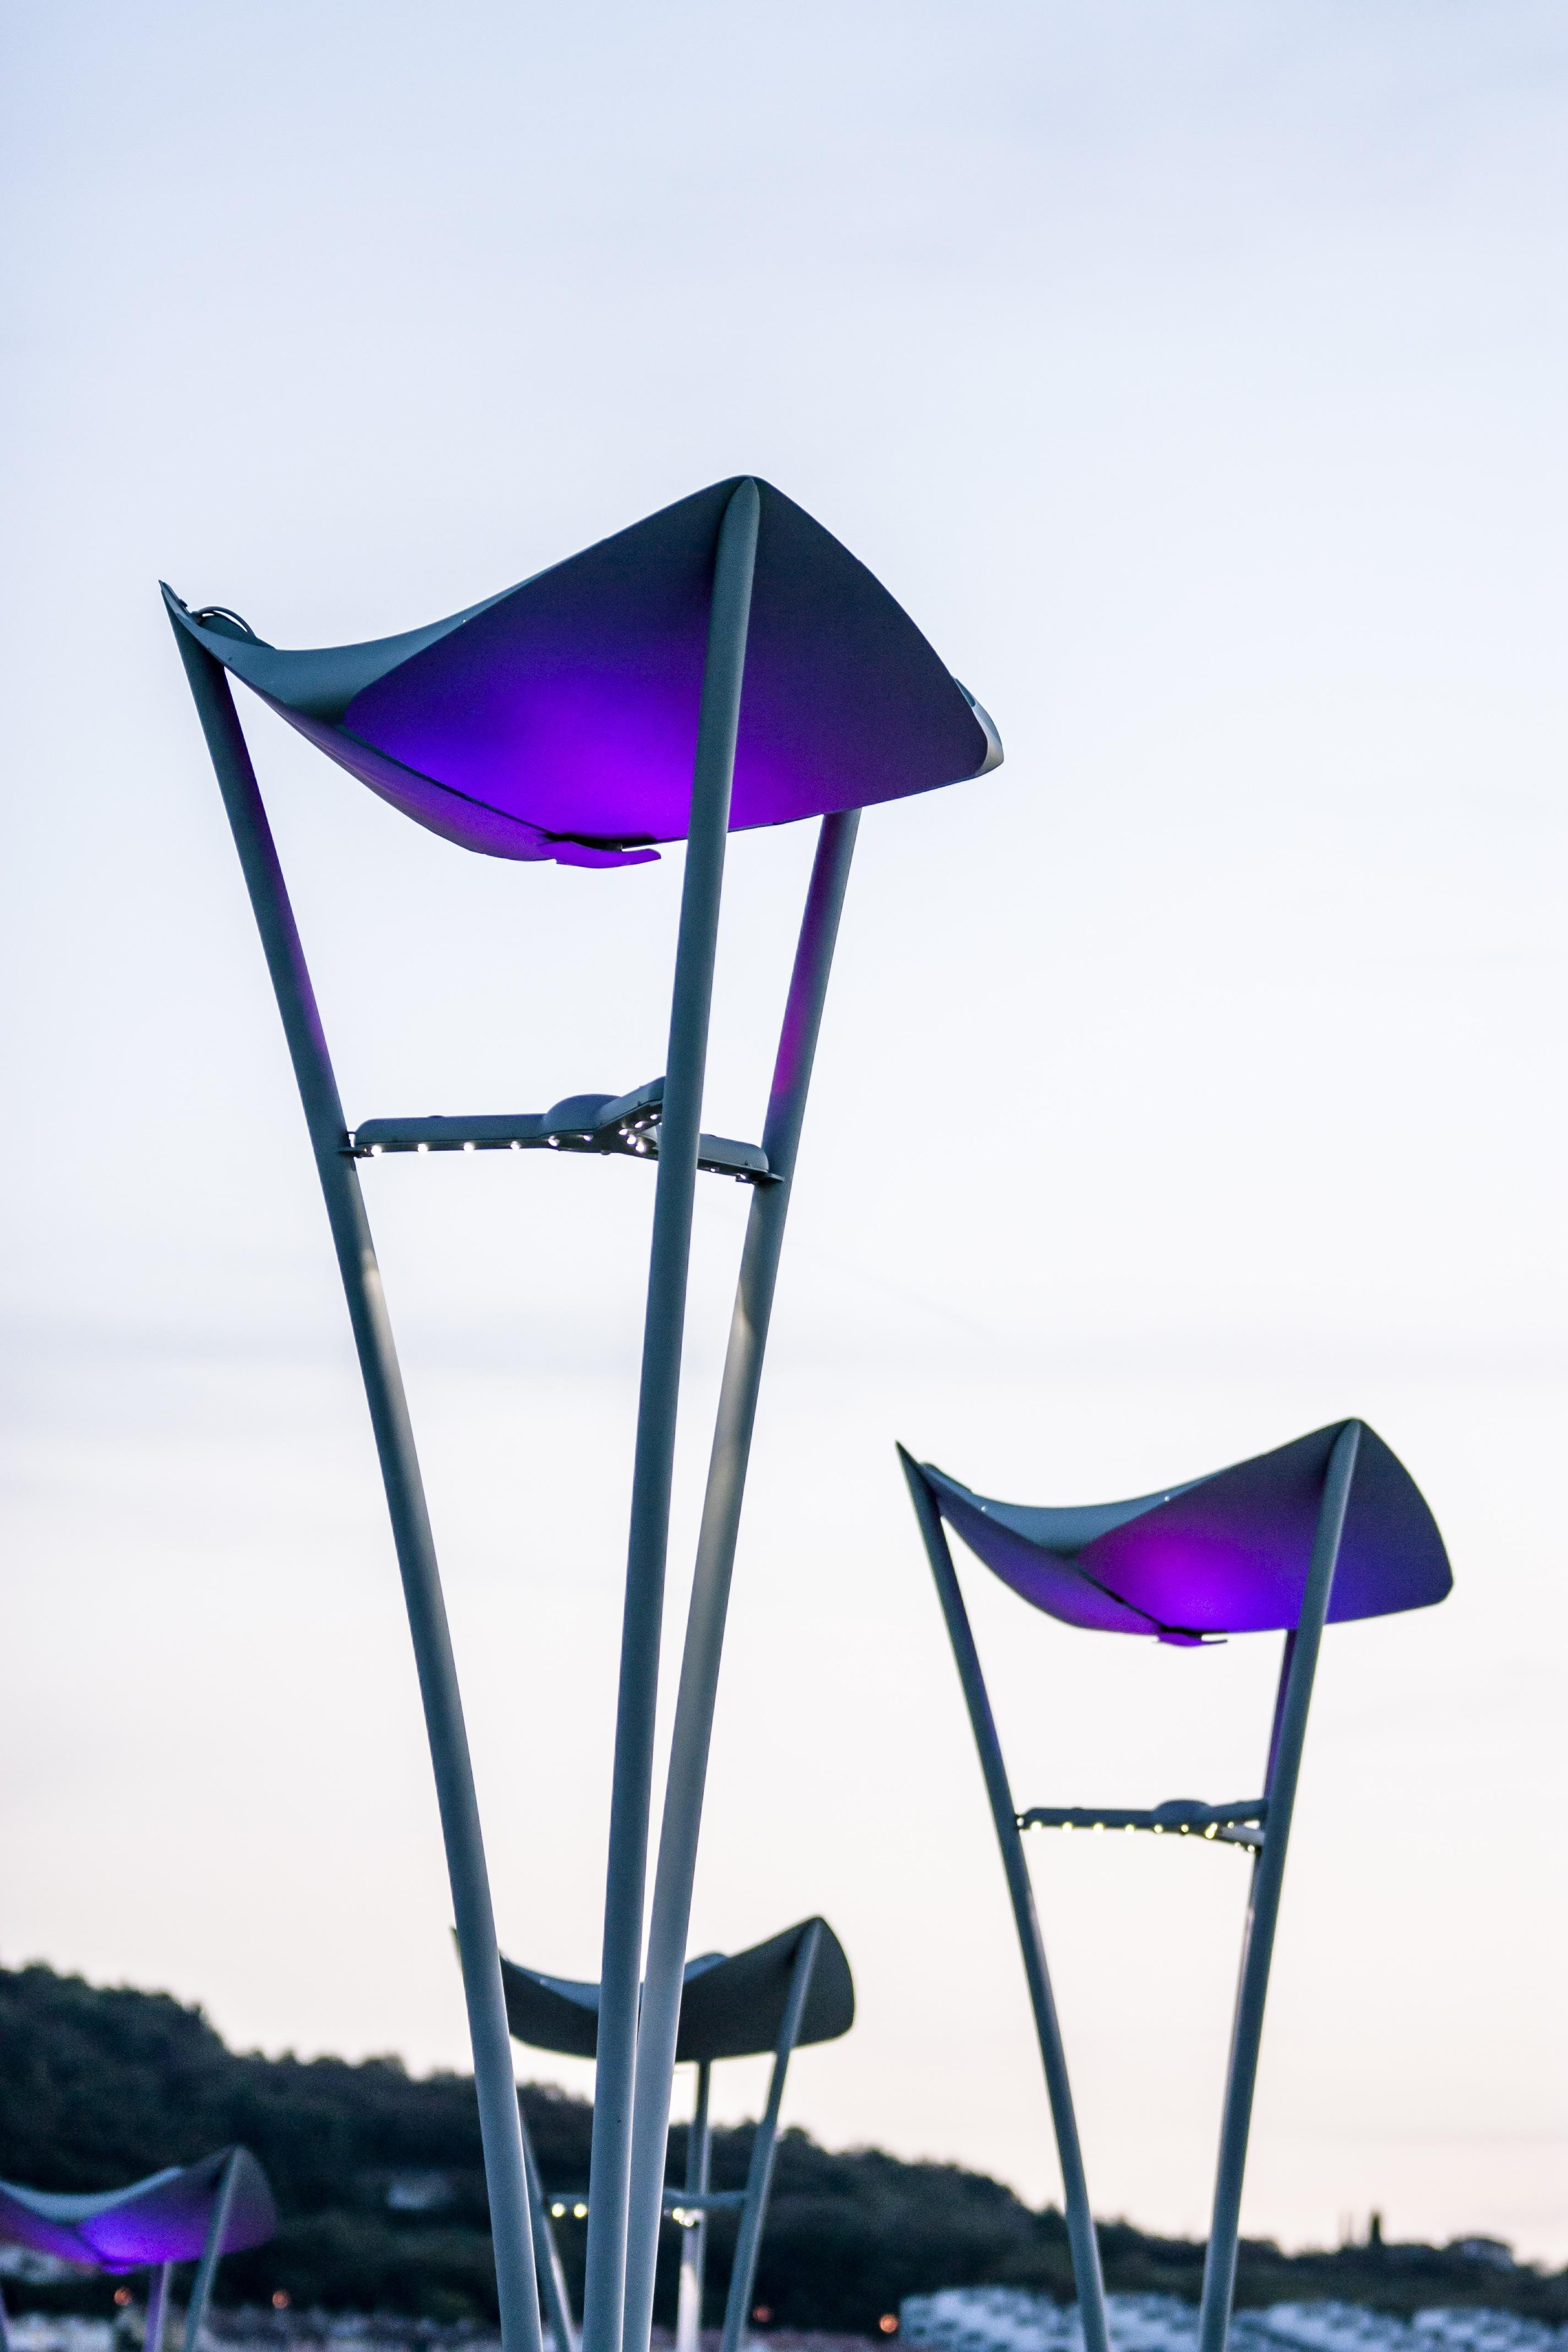 Lampioni da giardino a led solari e classici prezzi ed for Lampioni da giardino a sfera